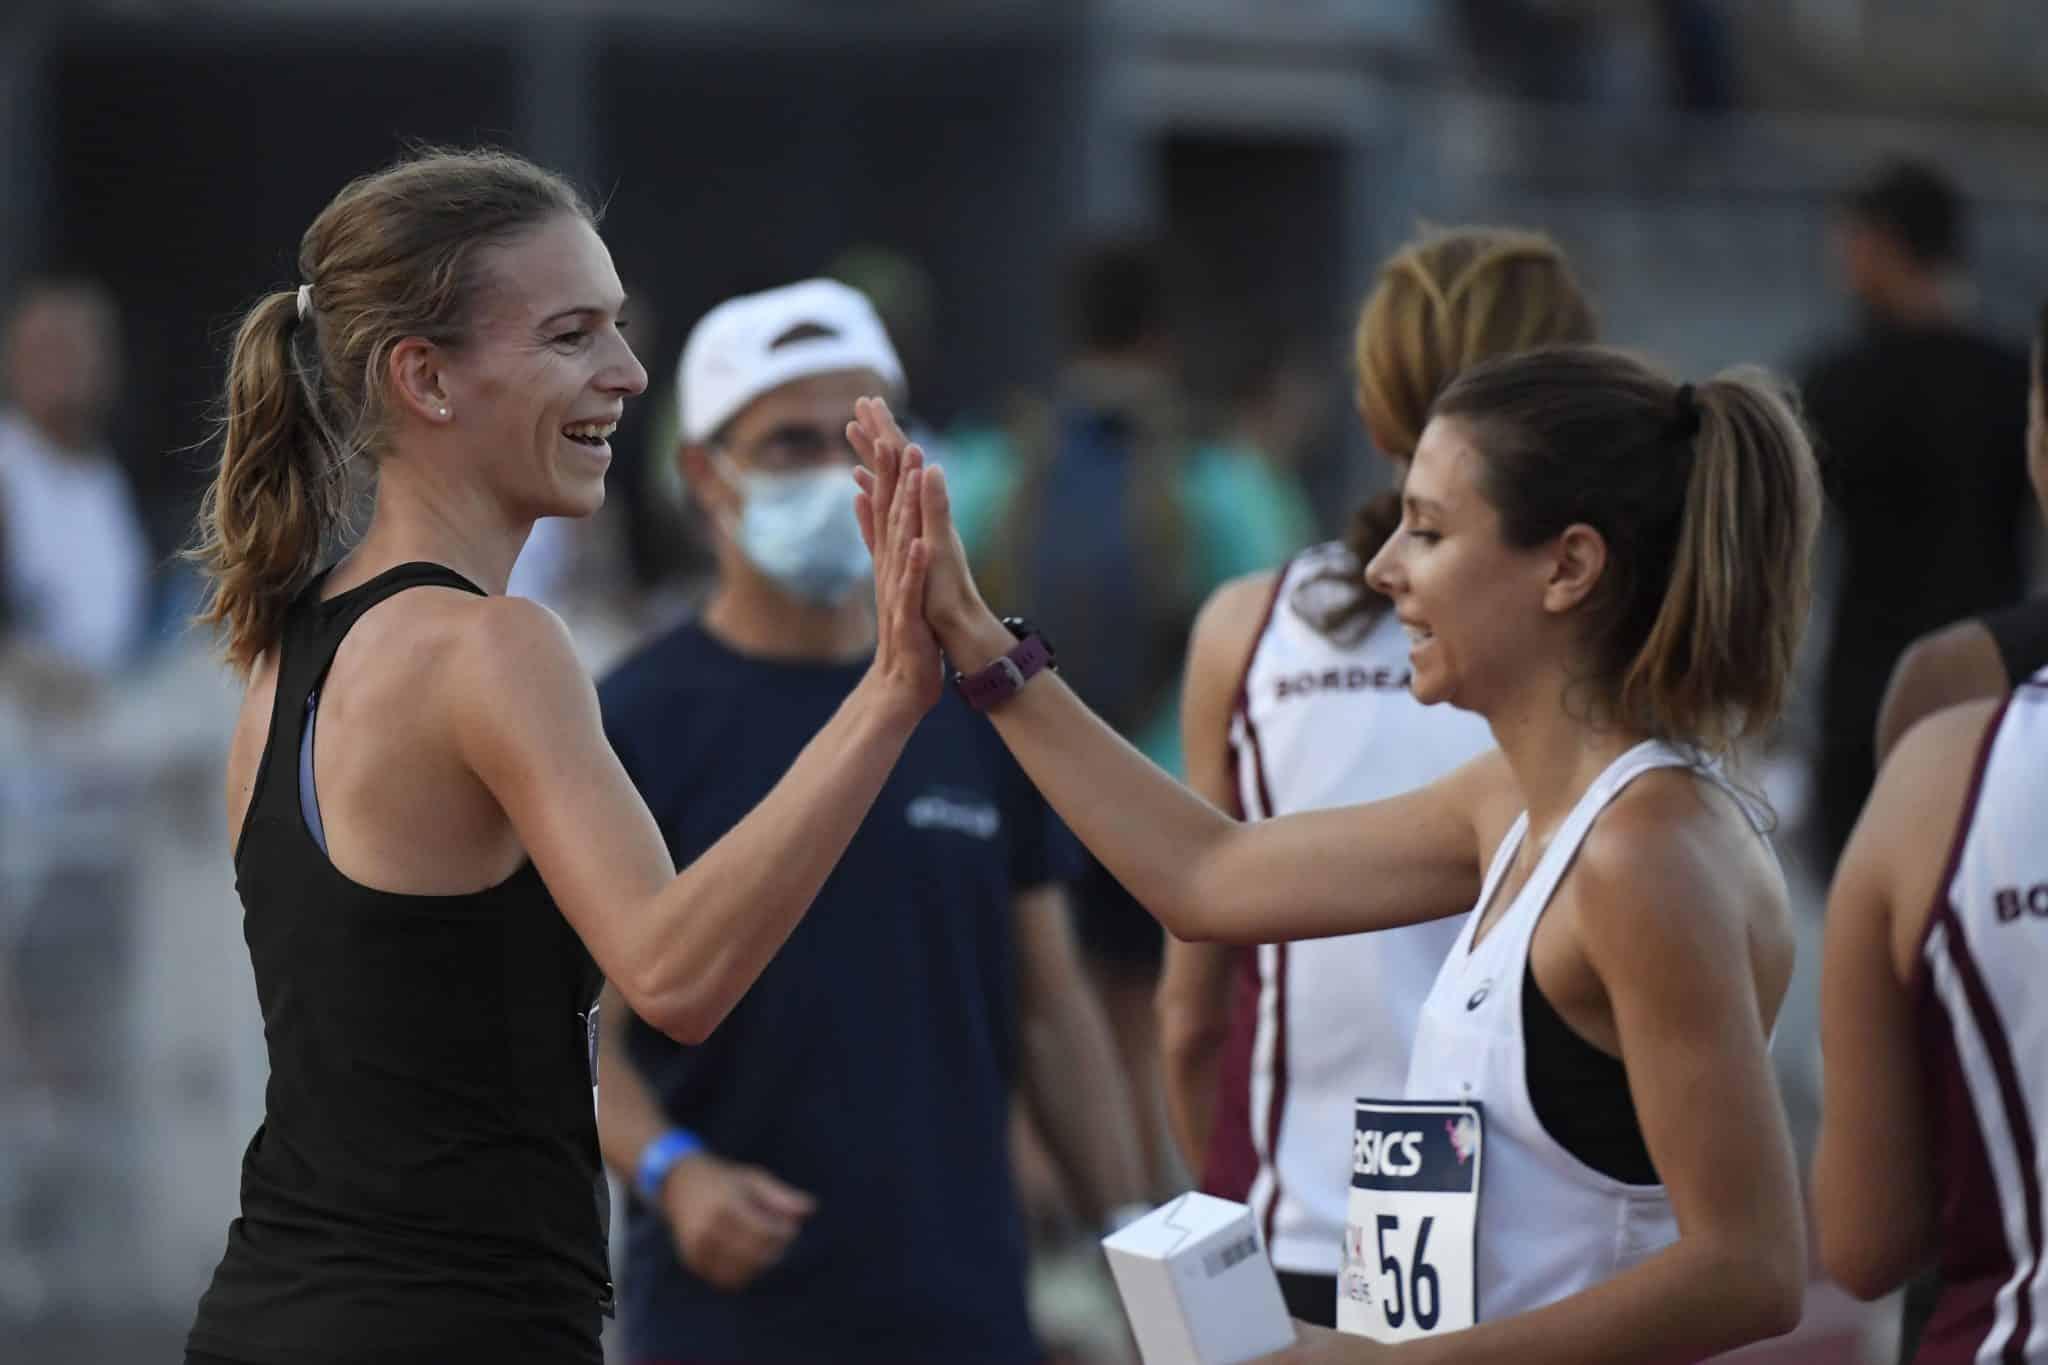 La Fédération d'athlétisme relance son Run 2k Challenge